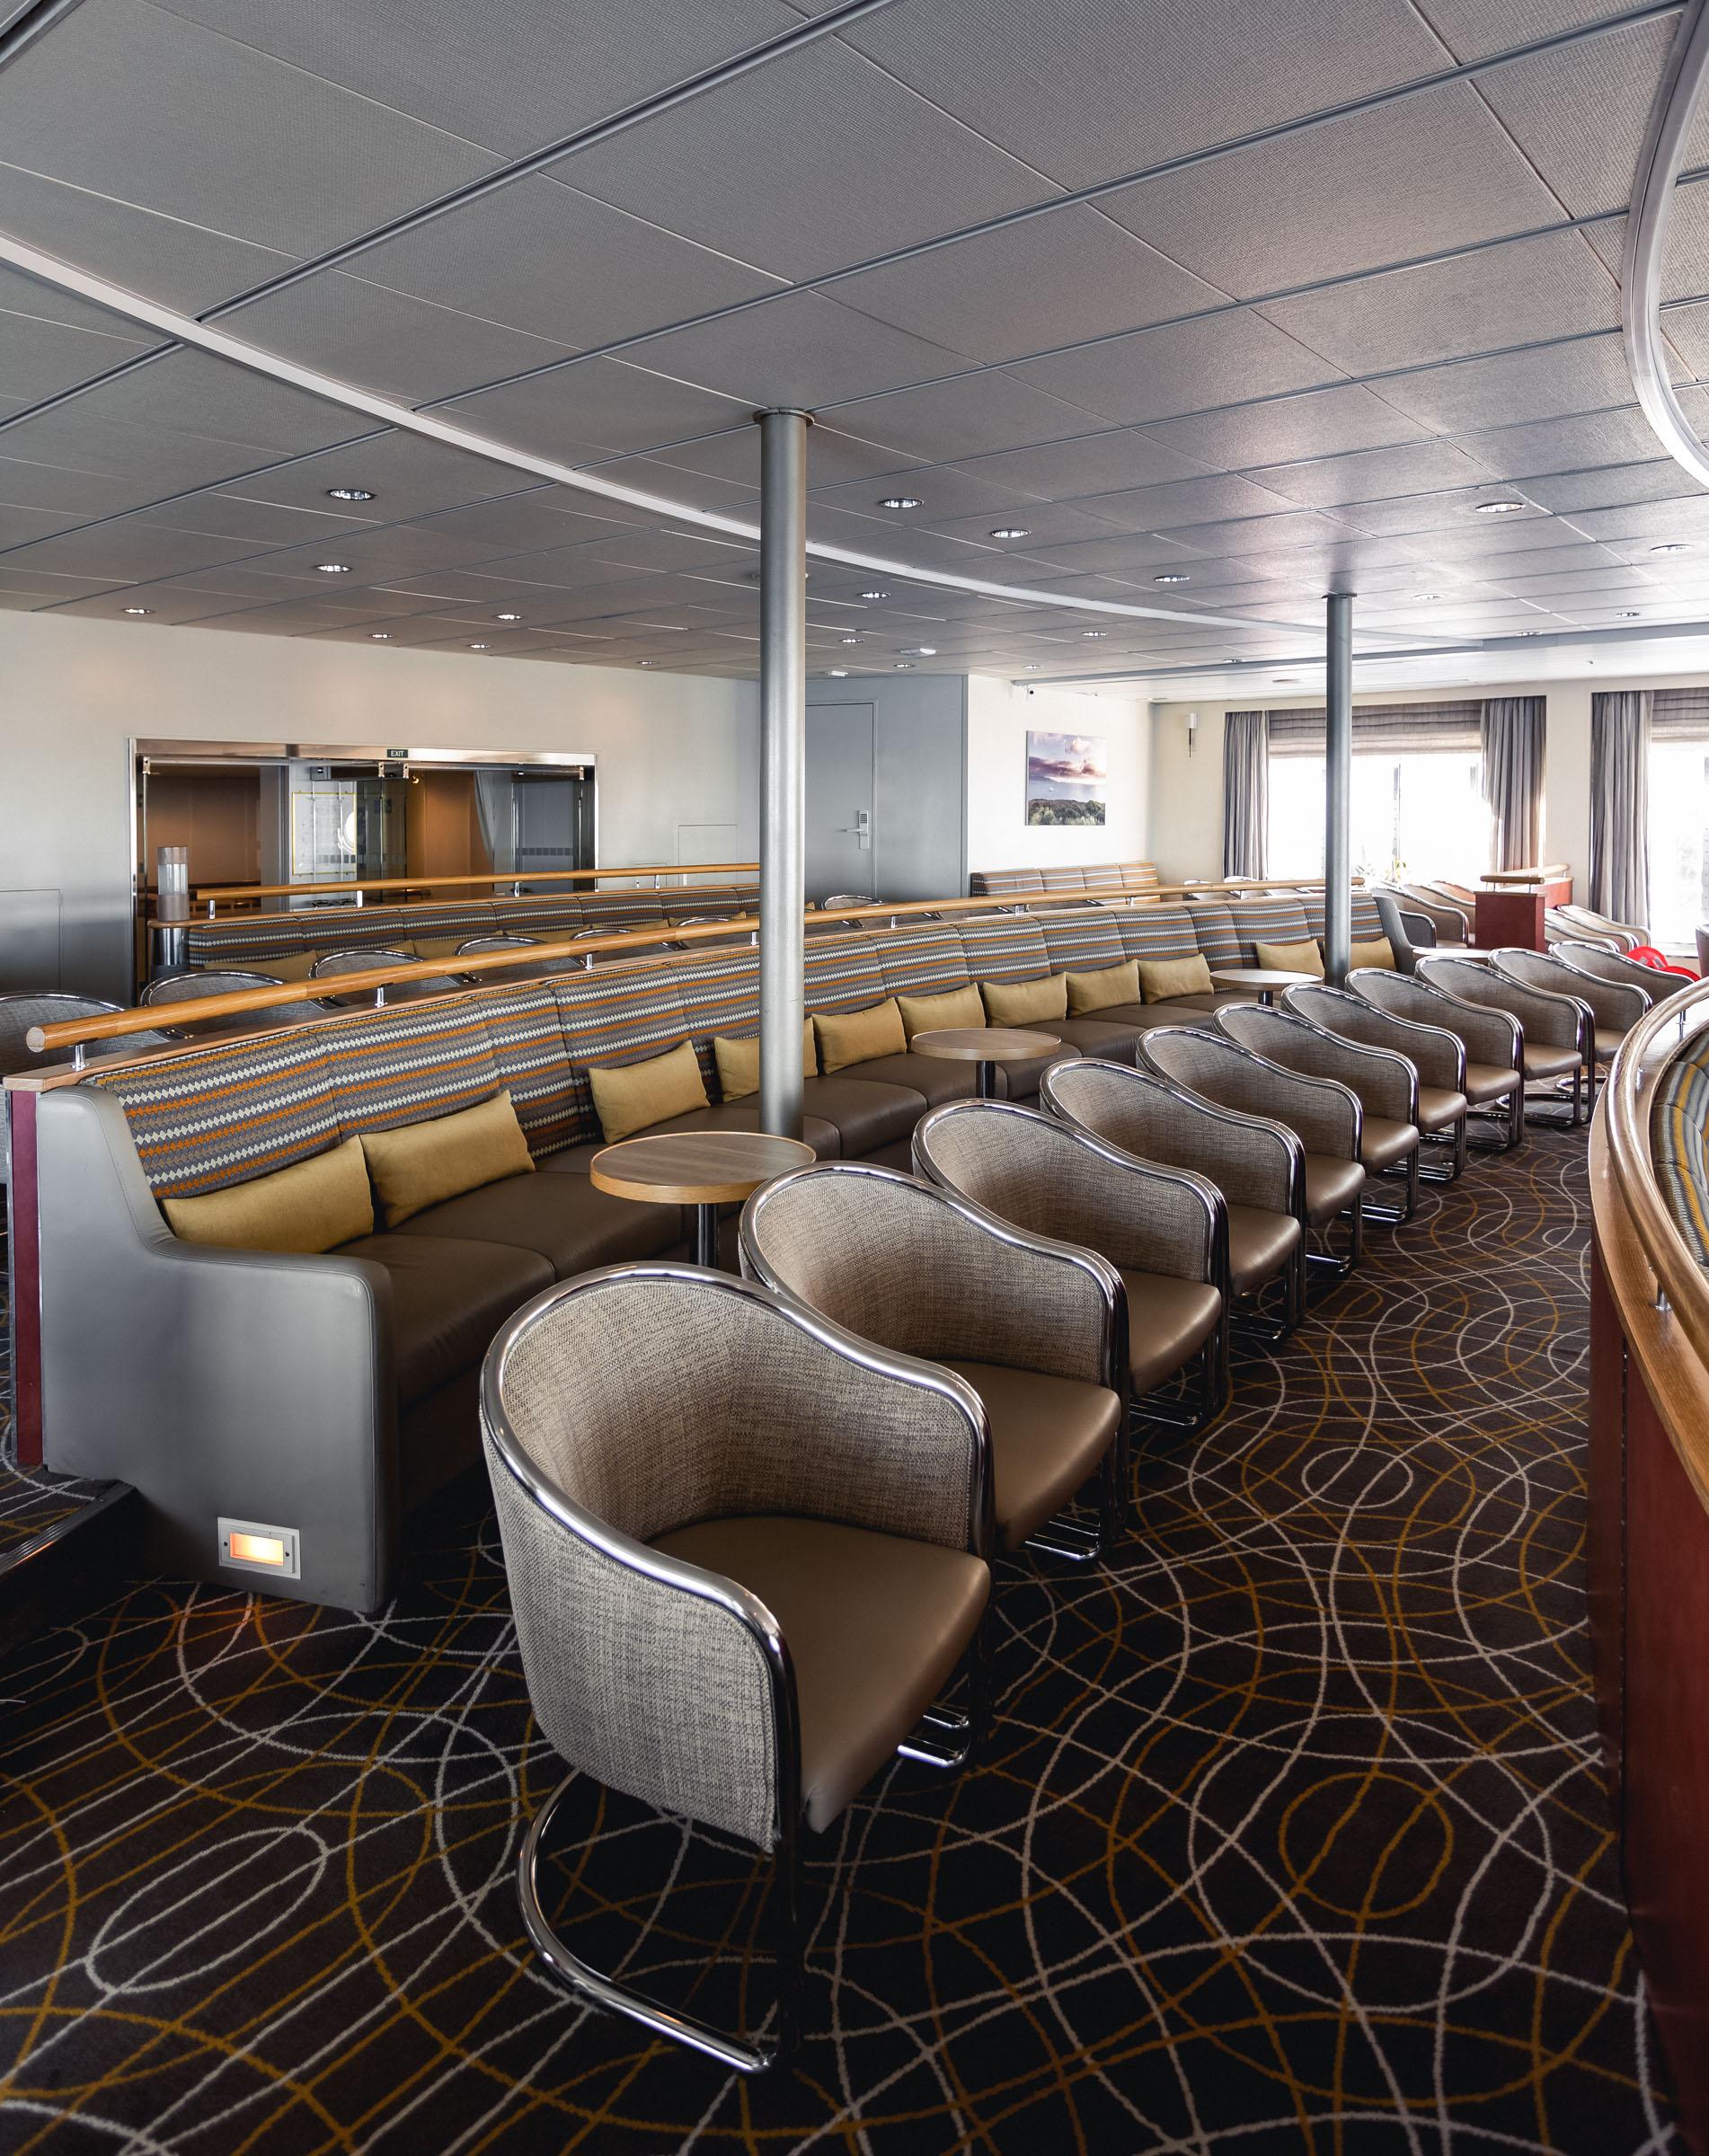 Panorama Lounge Image 1